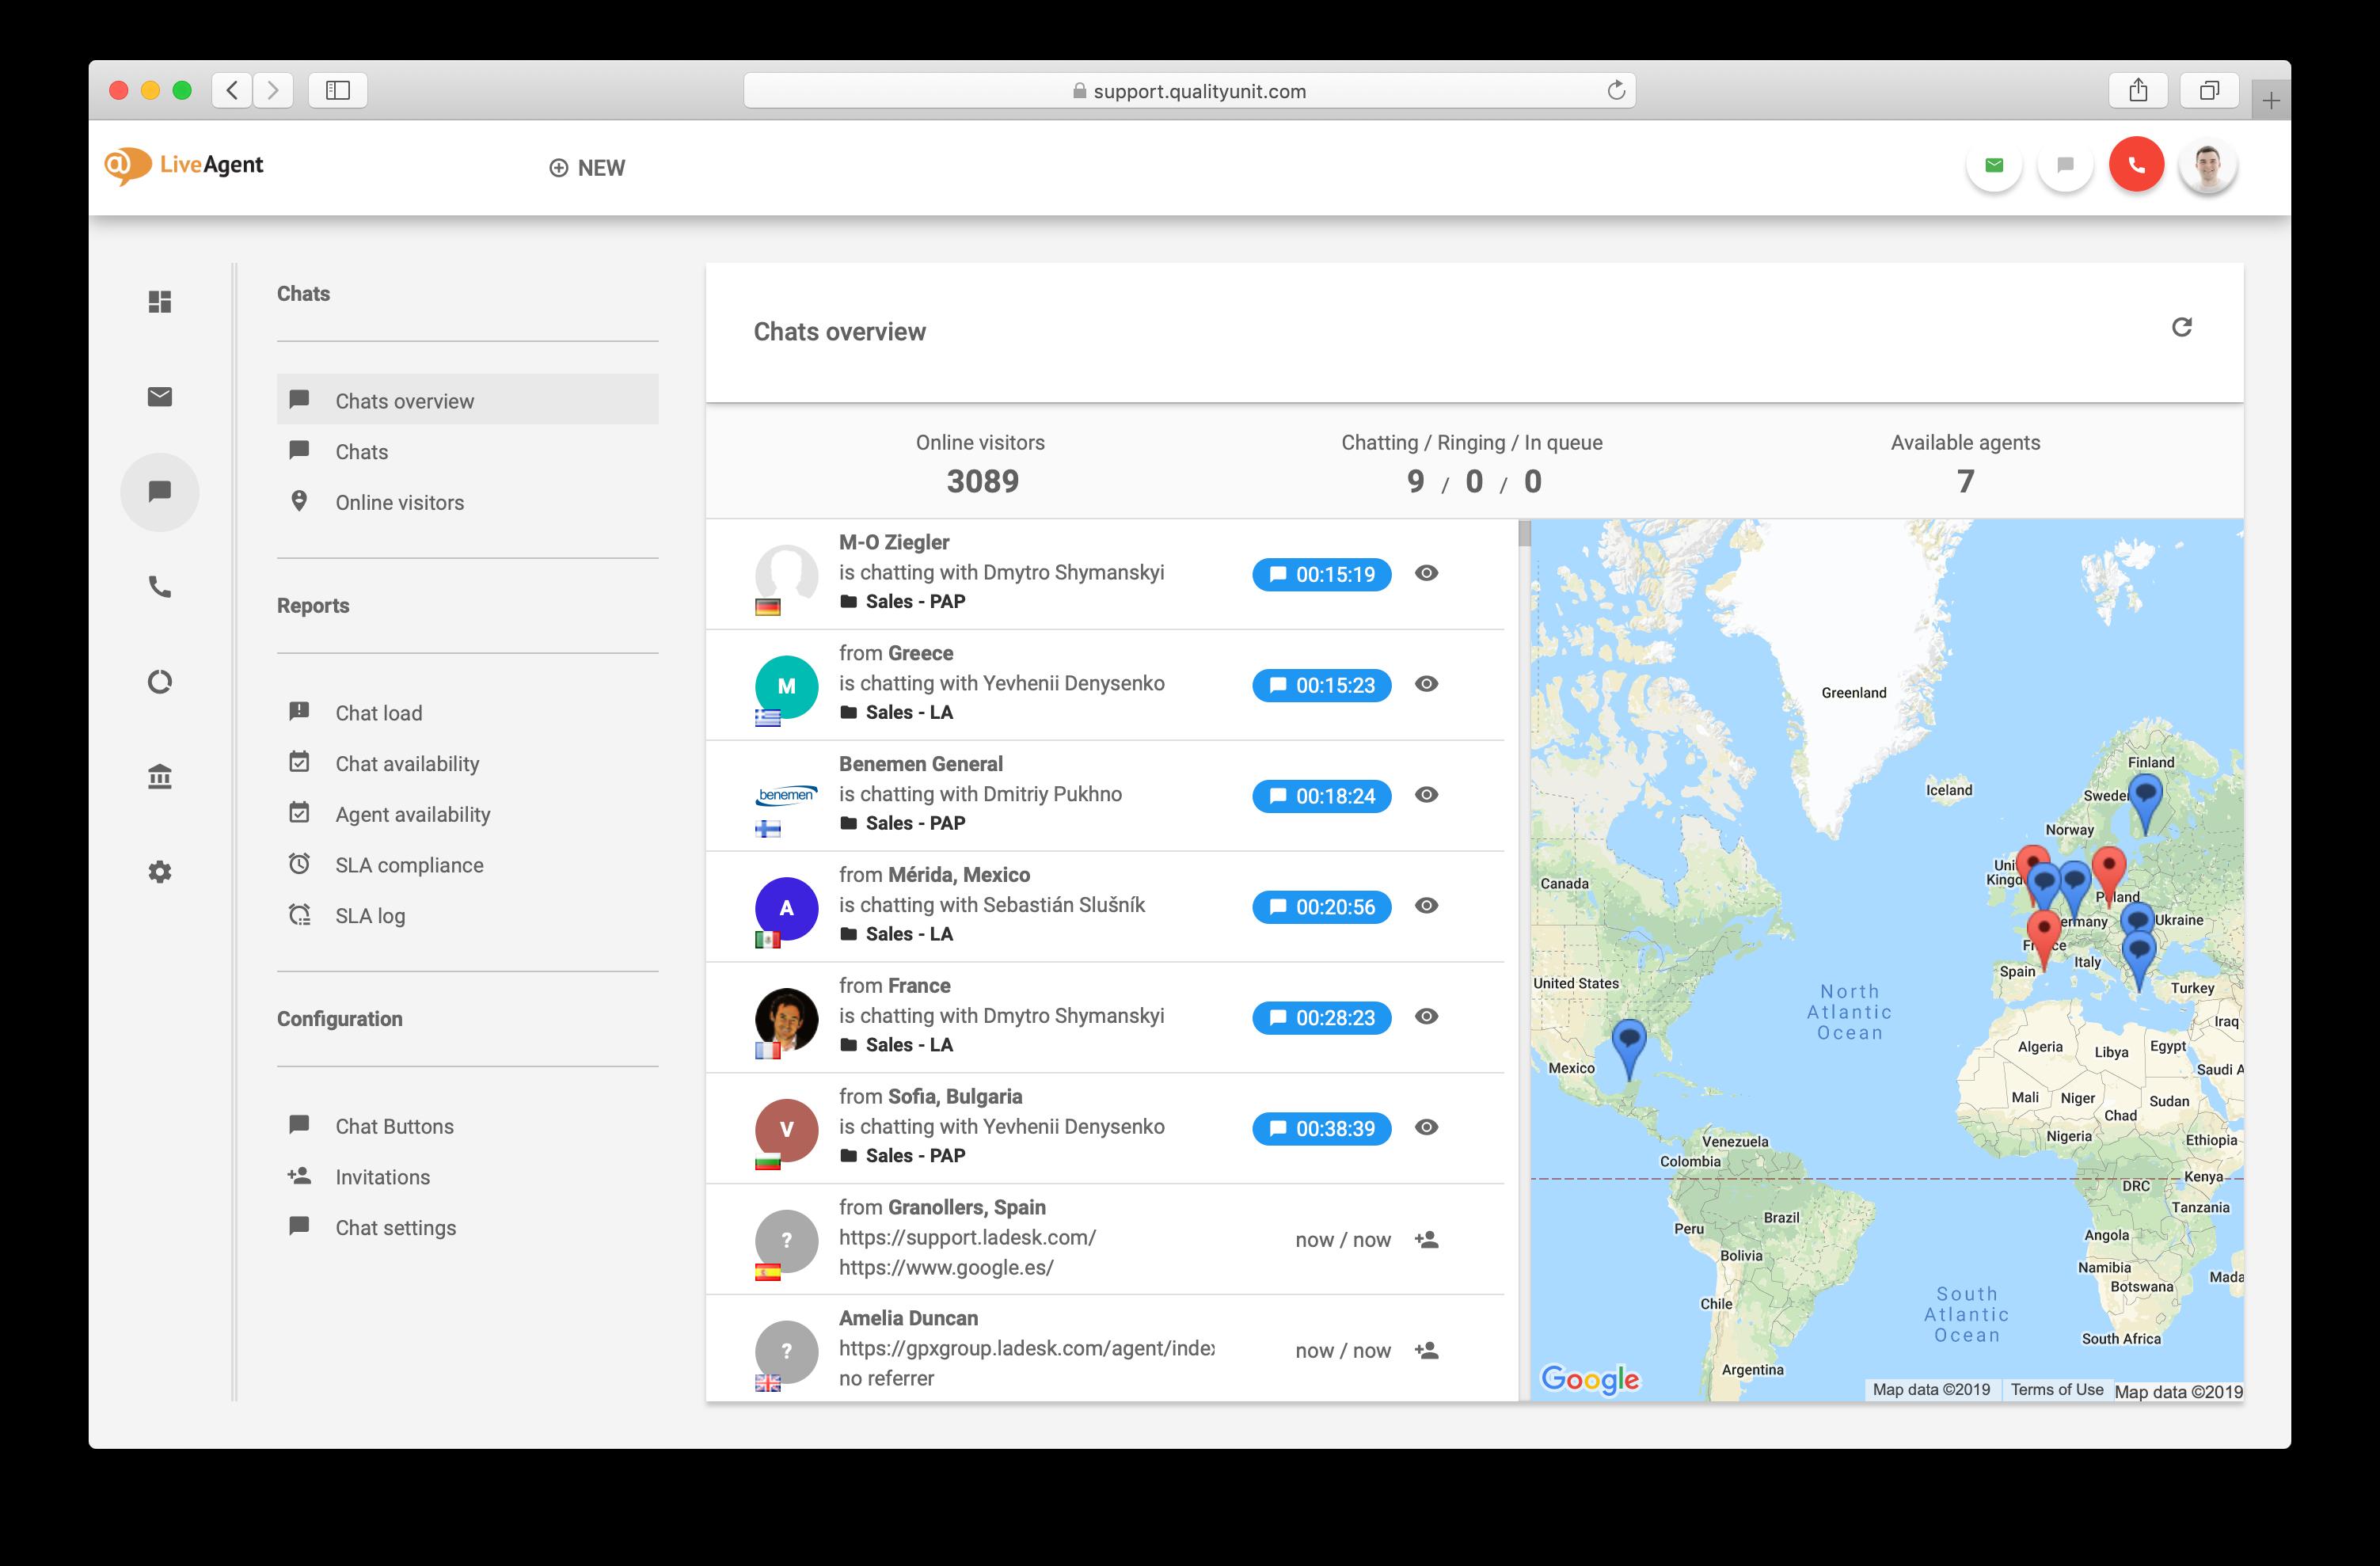 LiveAgent live chat overview